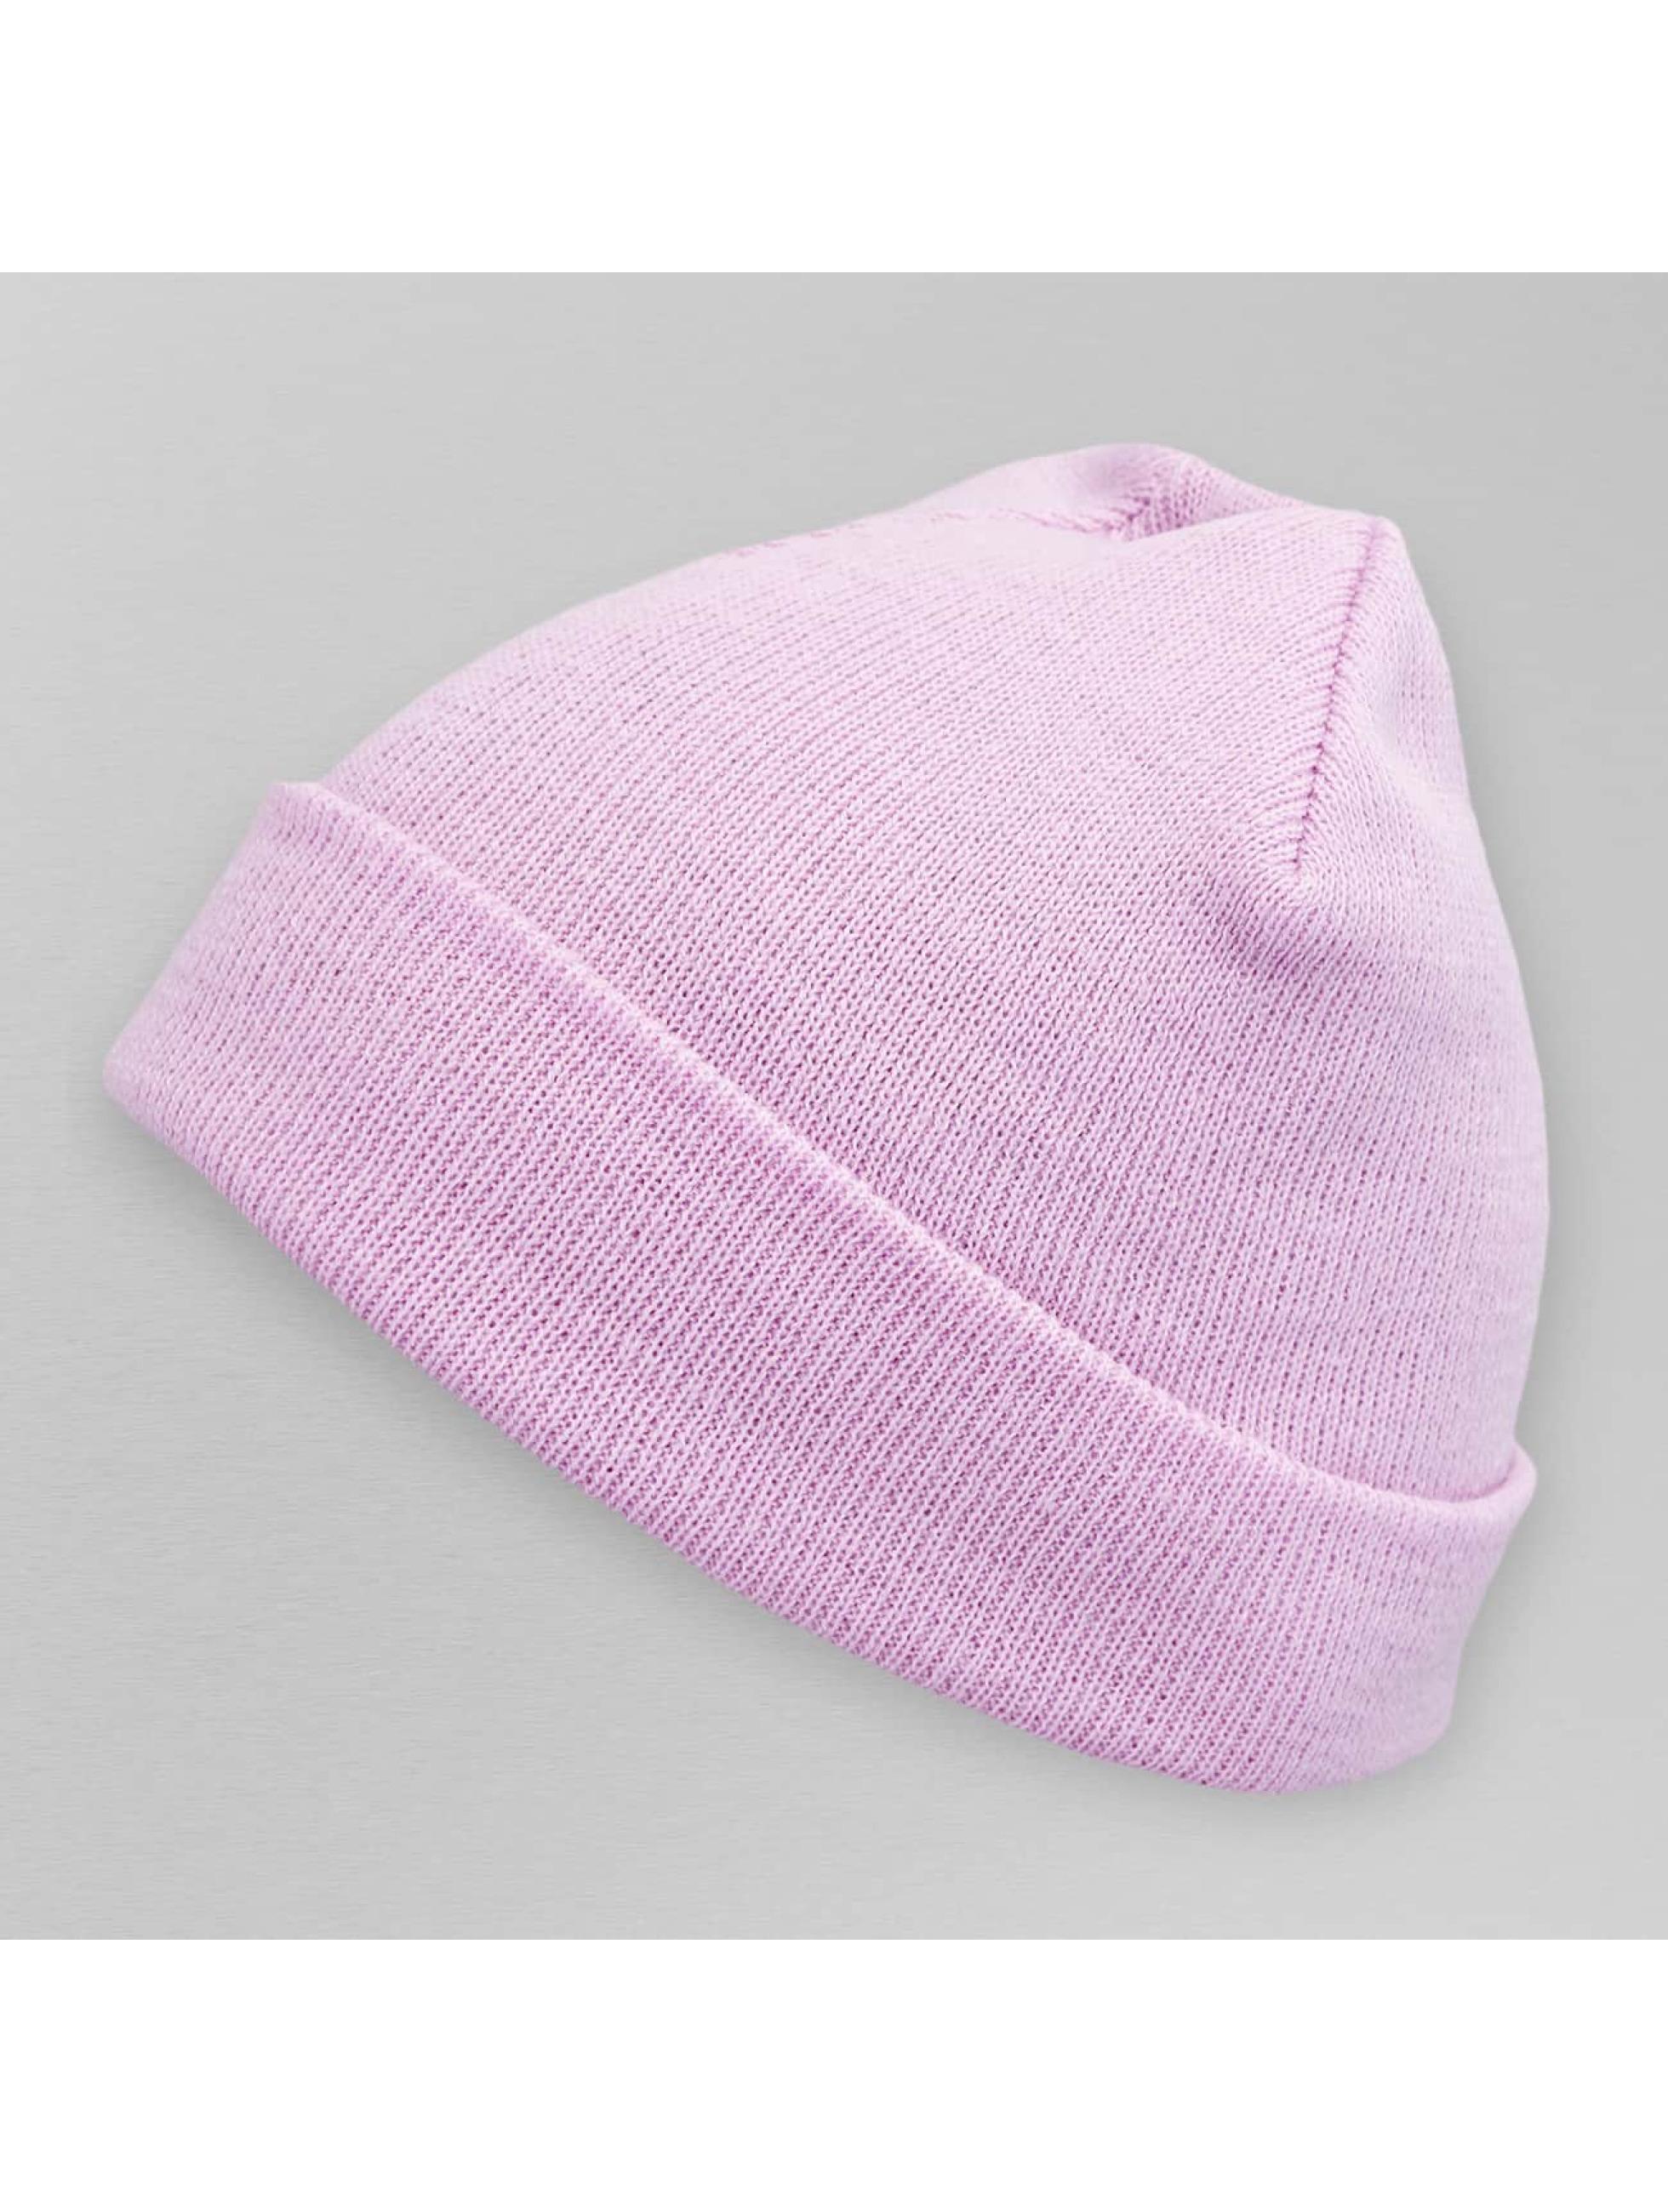 MSTRDS Beanie Pastel Basic Flap violet